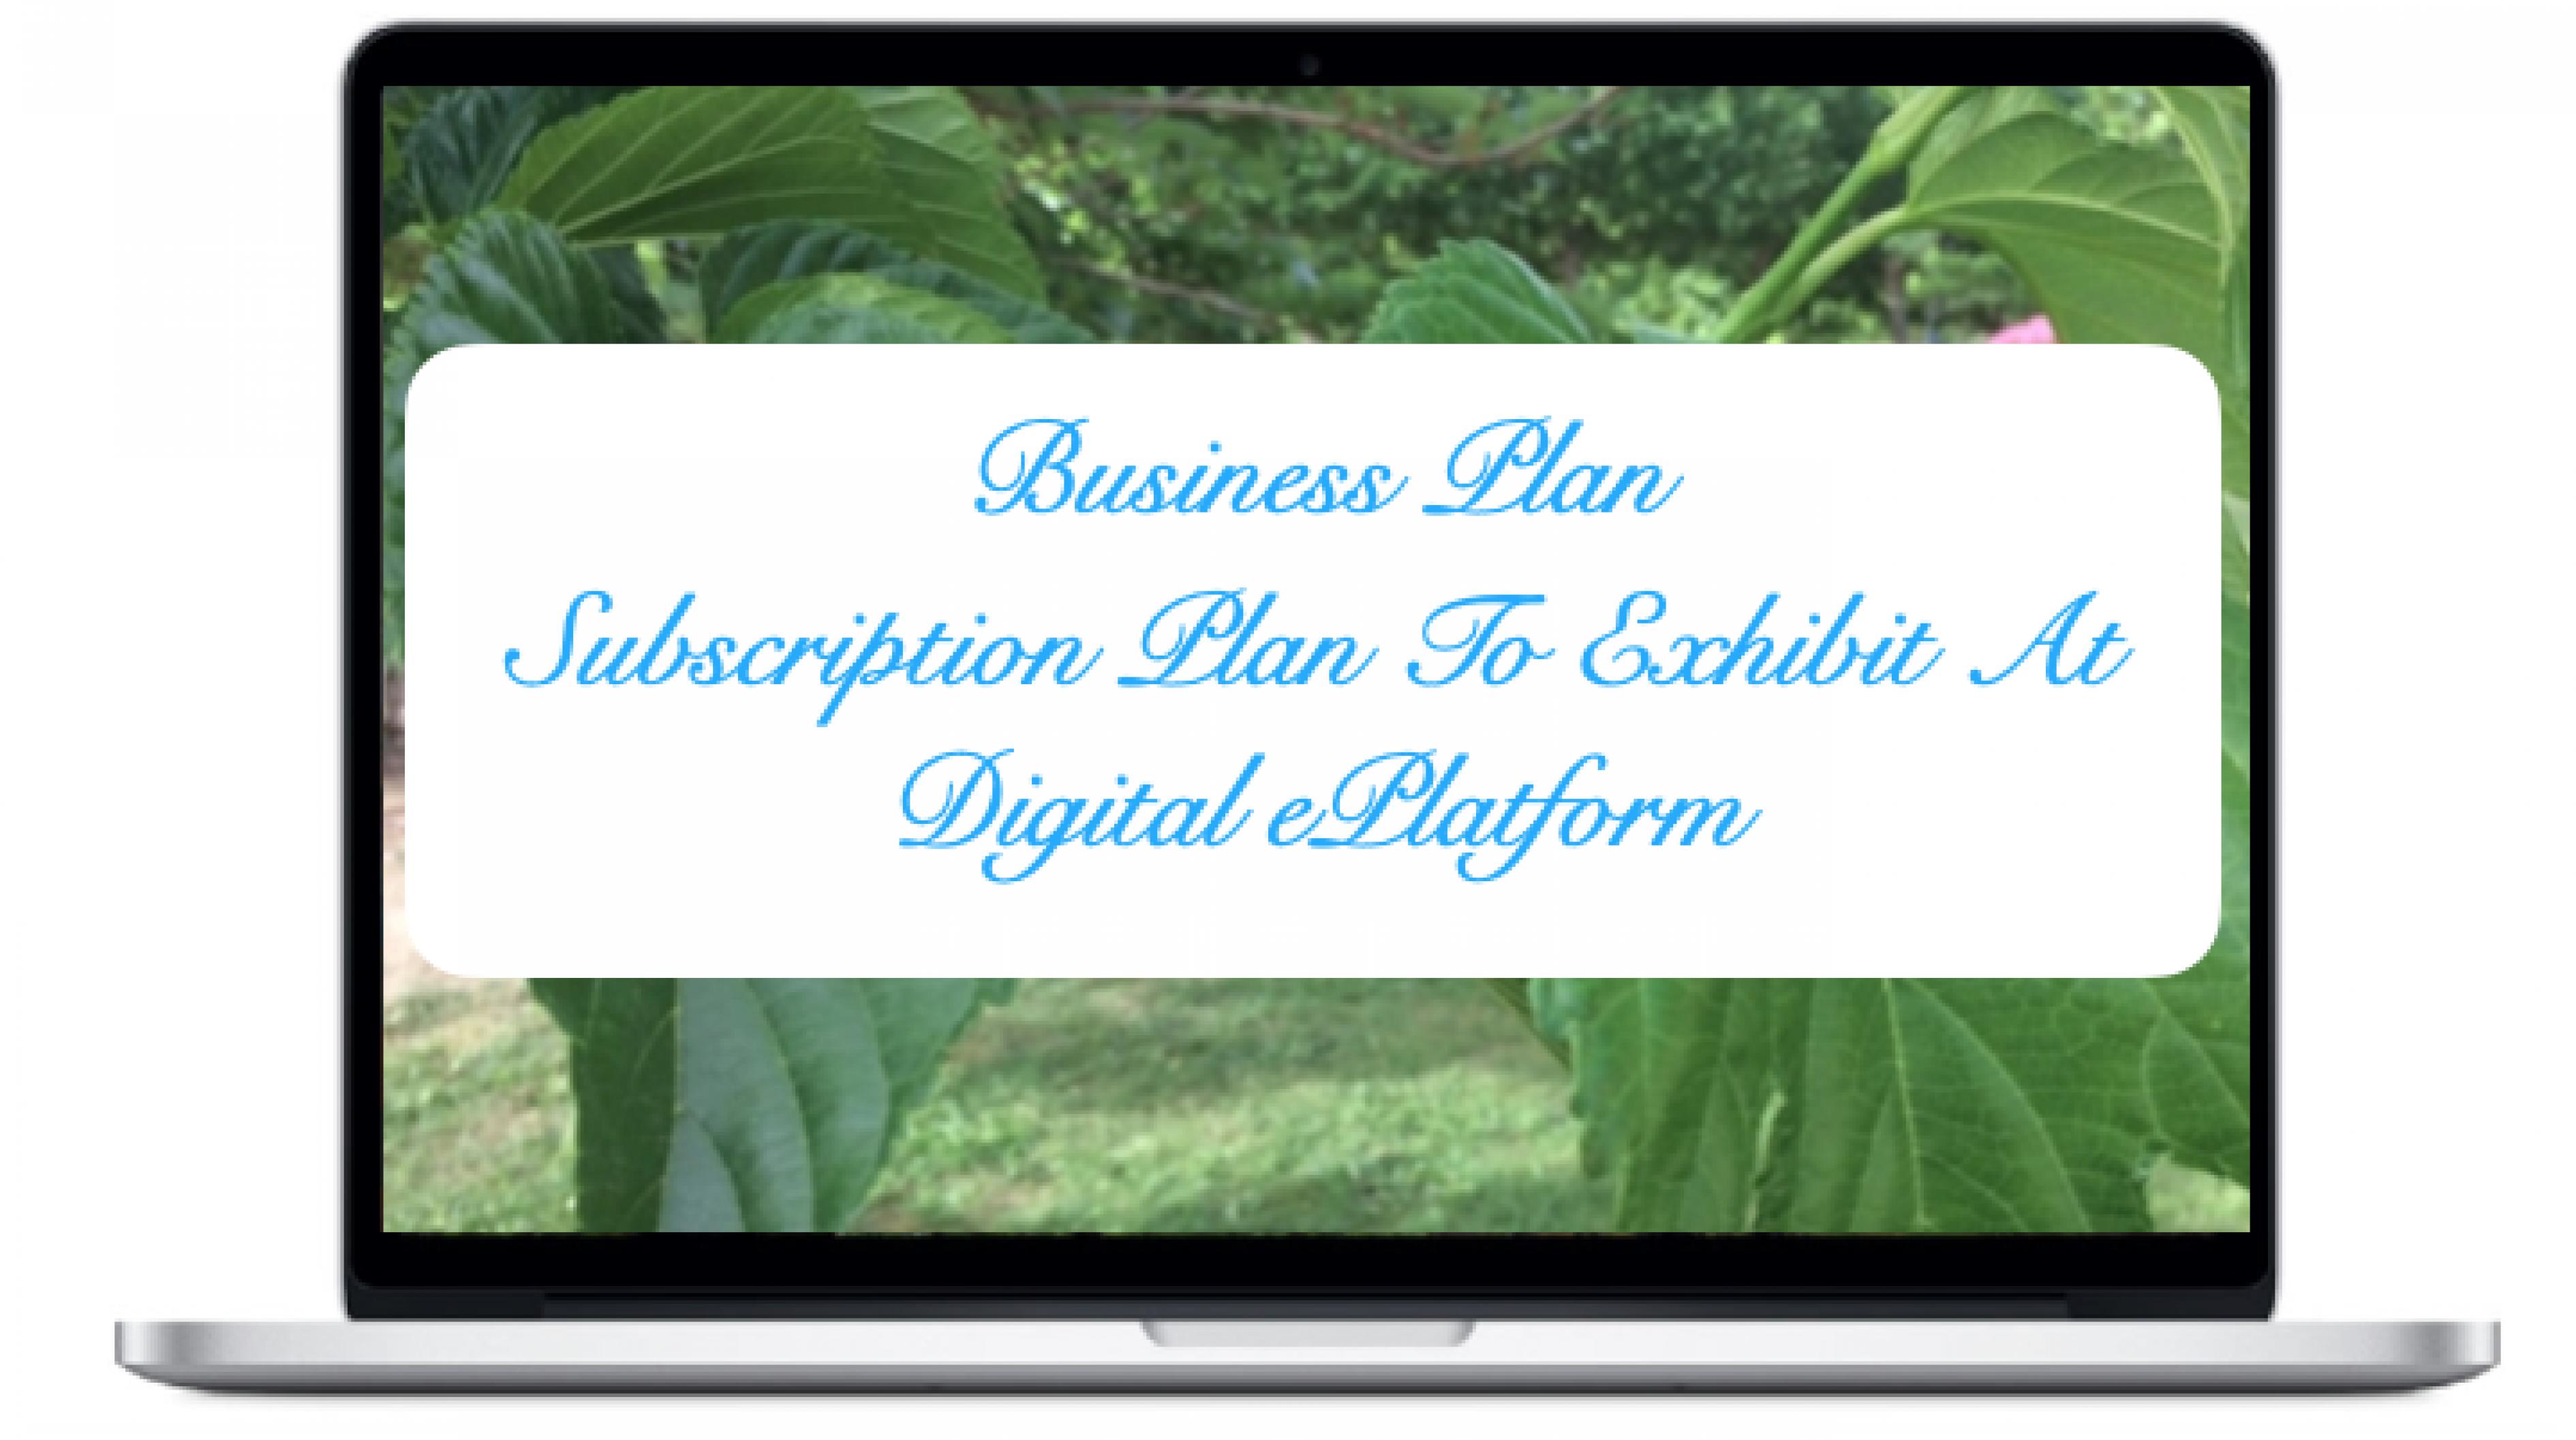 business-subscription-plan-to-exhibit-at-digital-eplatform_2